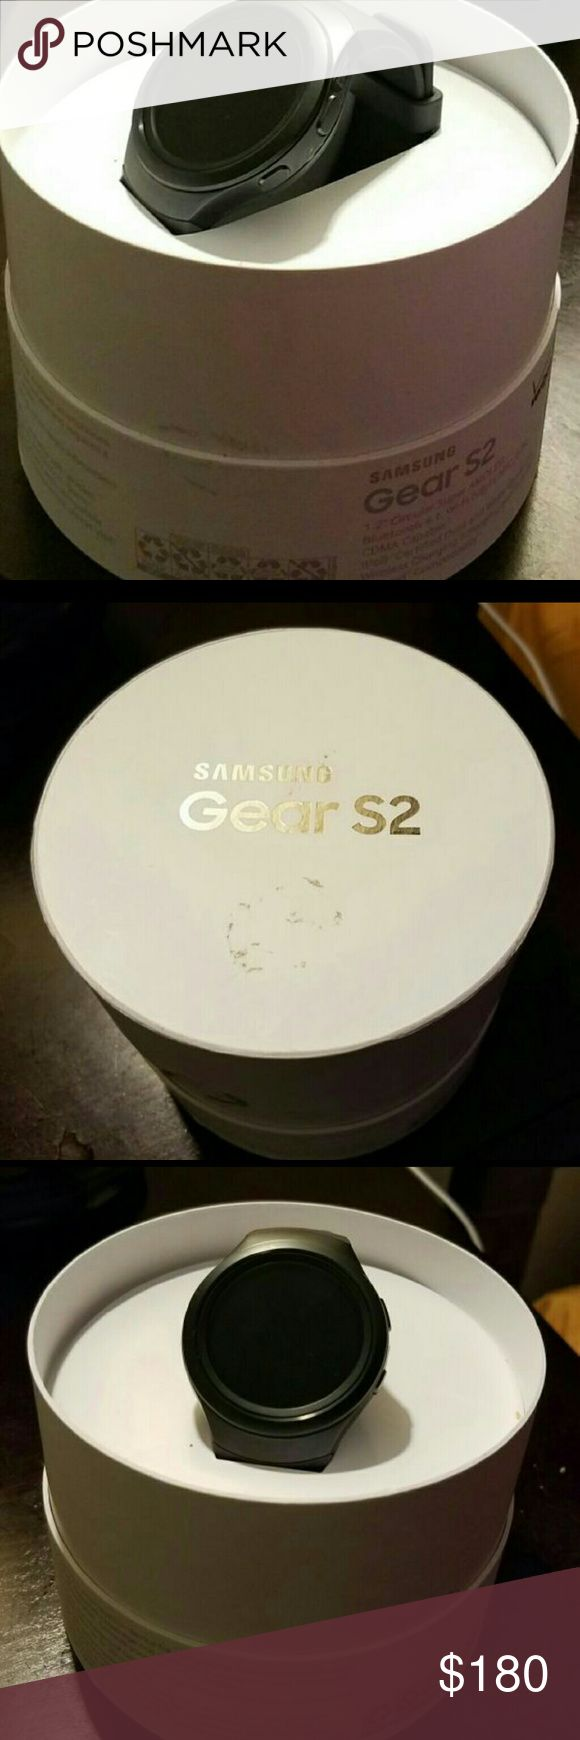 Samsung Galaxy S2 Watch Like new SAMSUNG GALAXY S2 WATCH  very nice Xmas gift. Comes with original box as well. samsung Jewelry